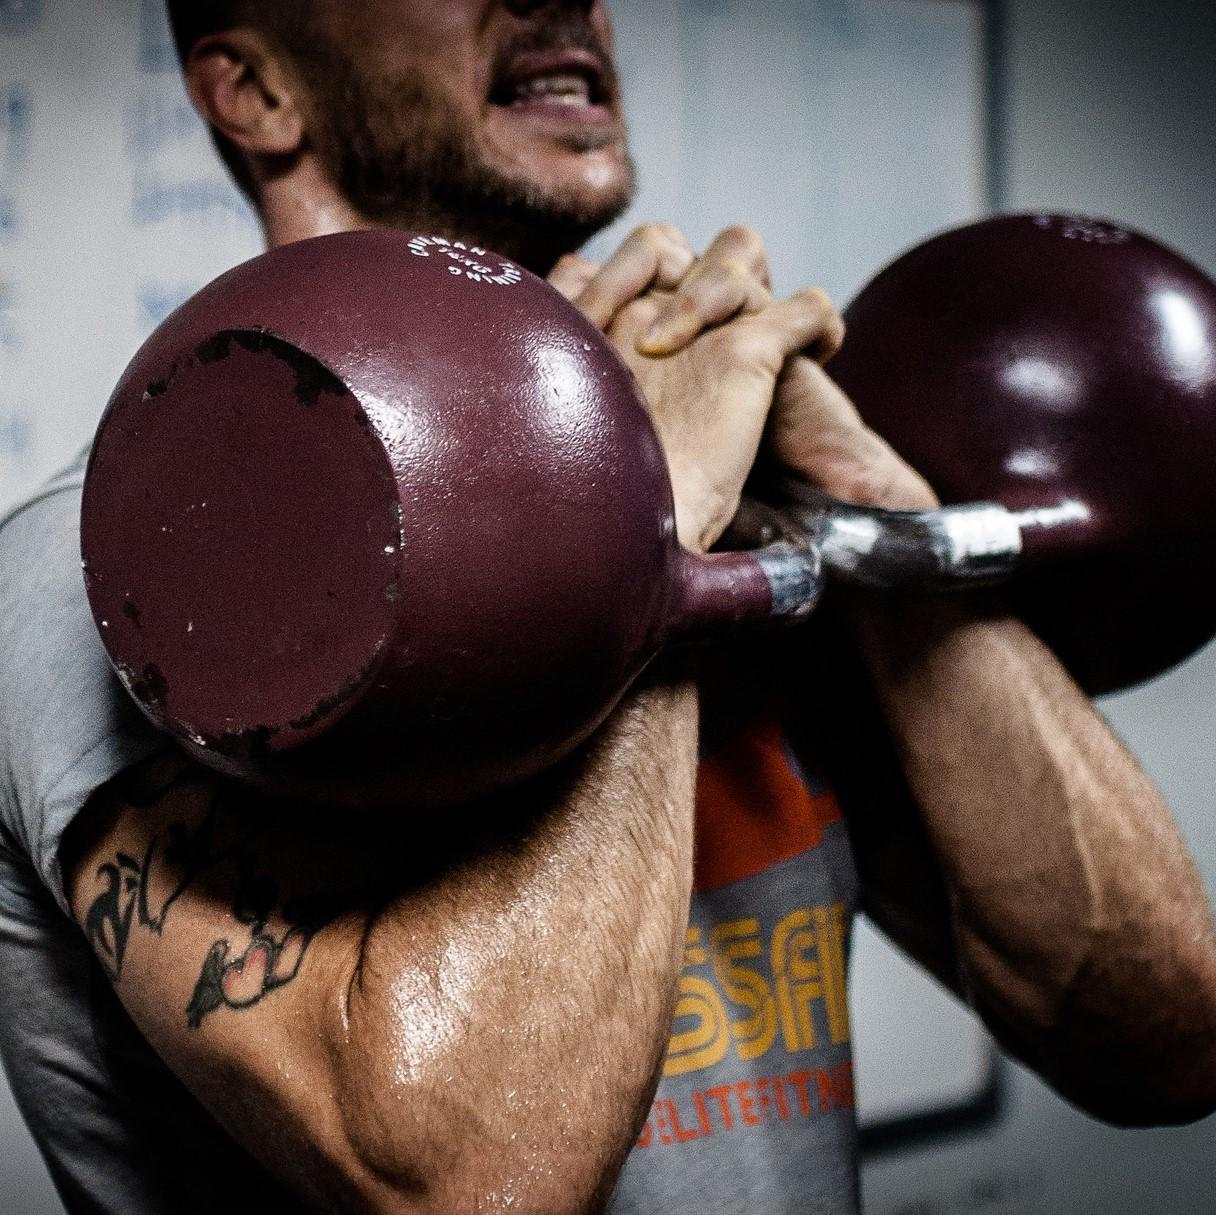 A man lifting kettlebells